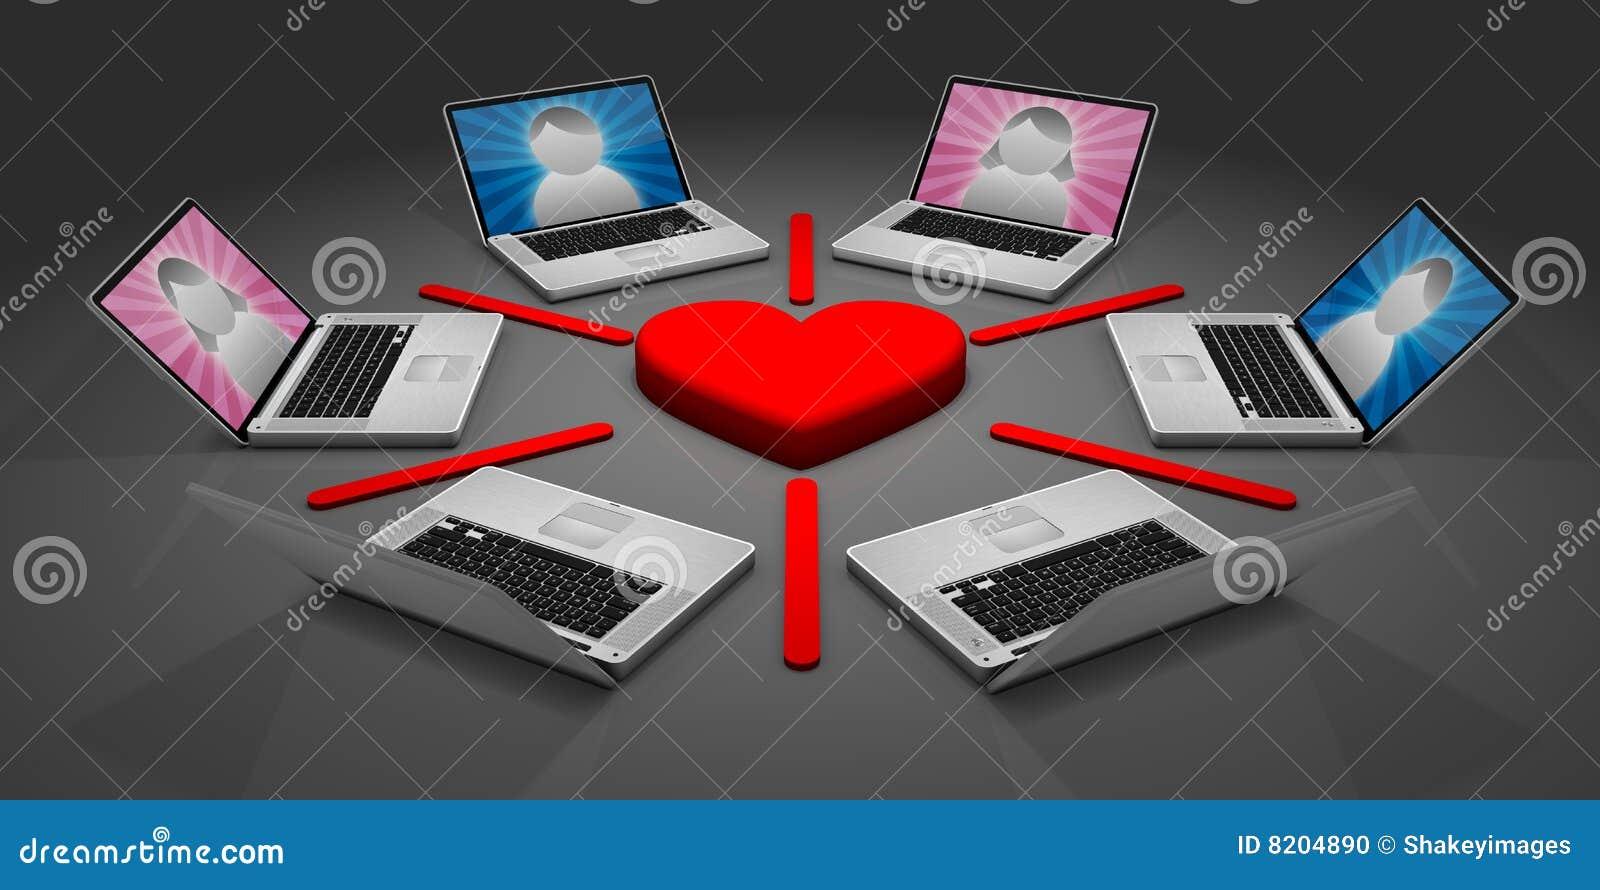 Matchmaking network